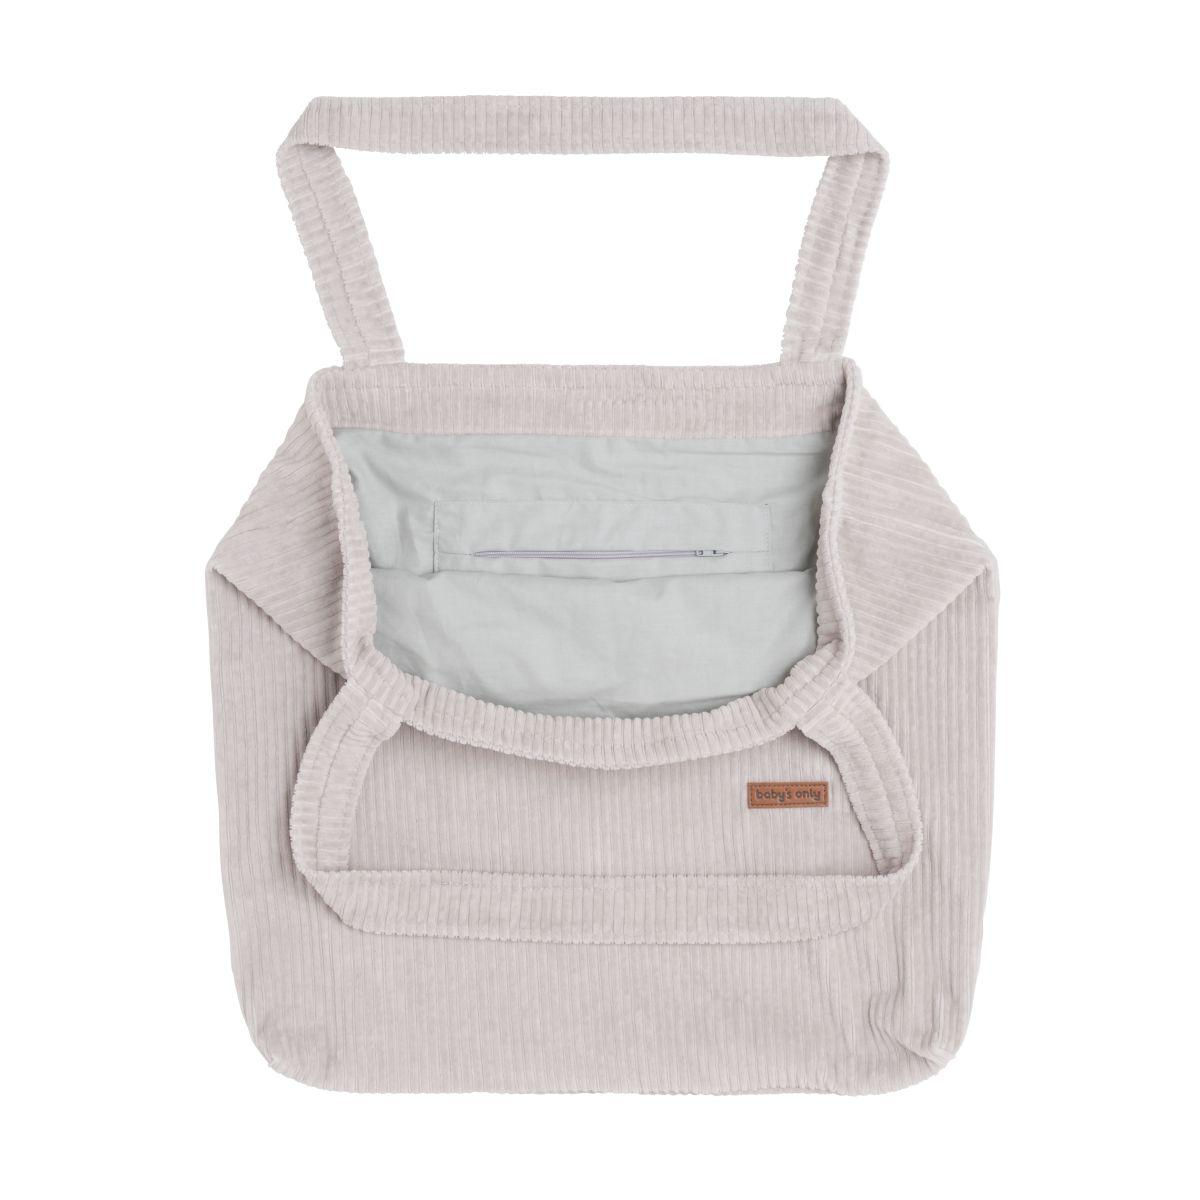 babys only bo02489002350 mom bag sense kiezelgrijs 2